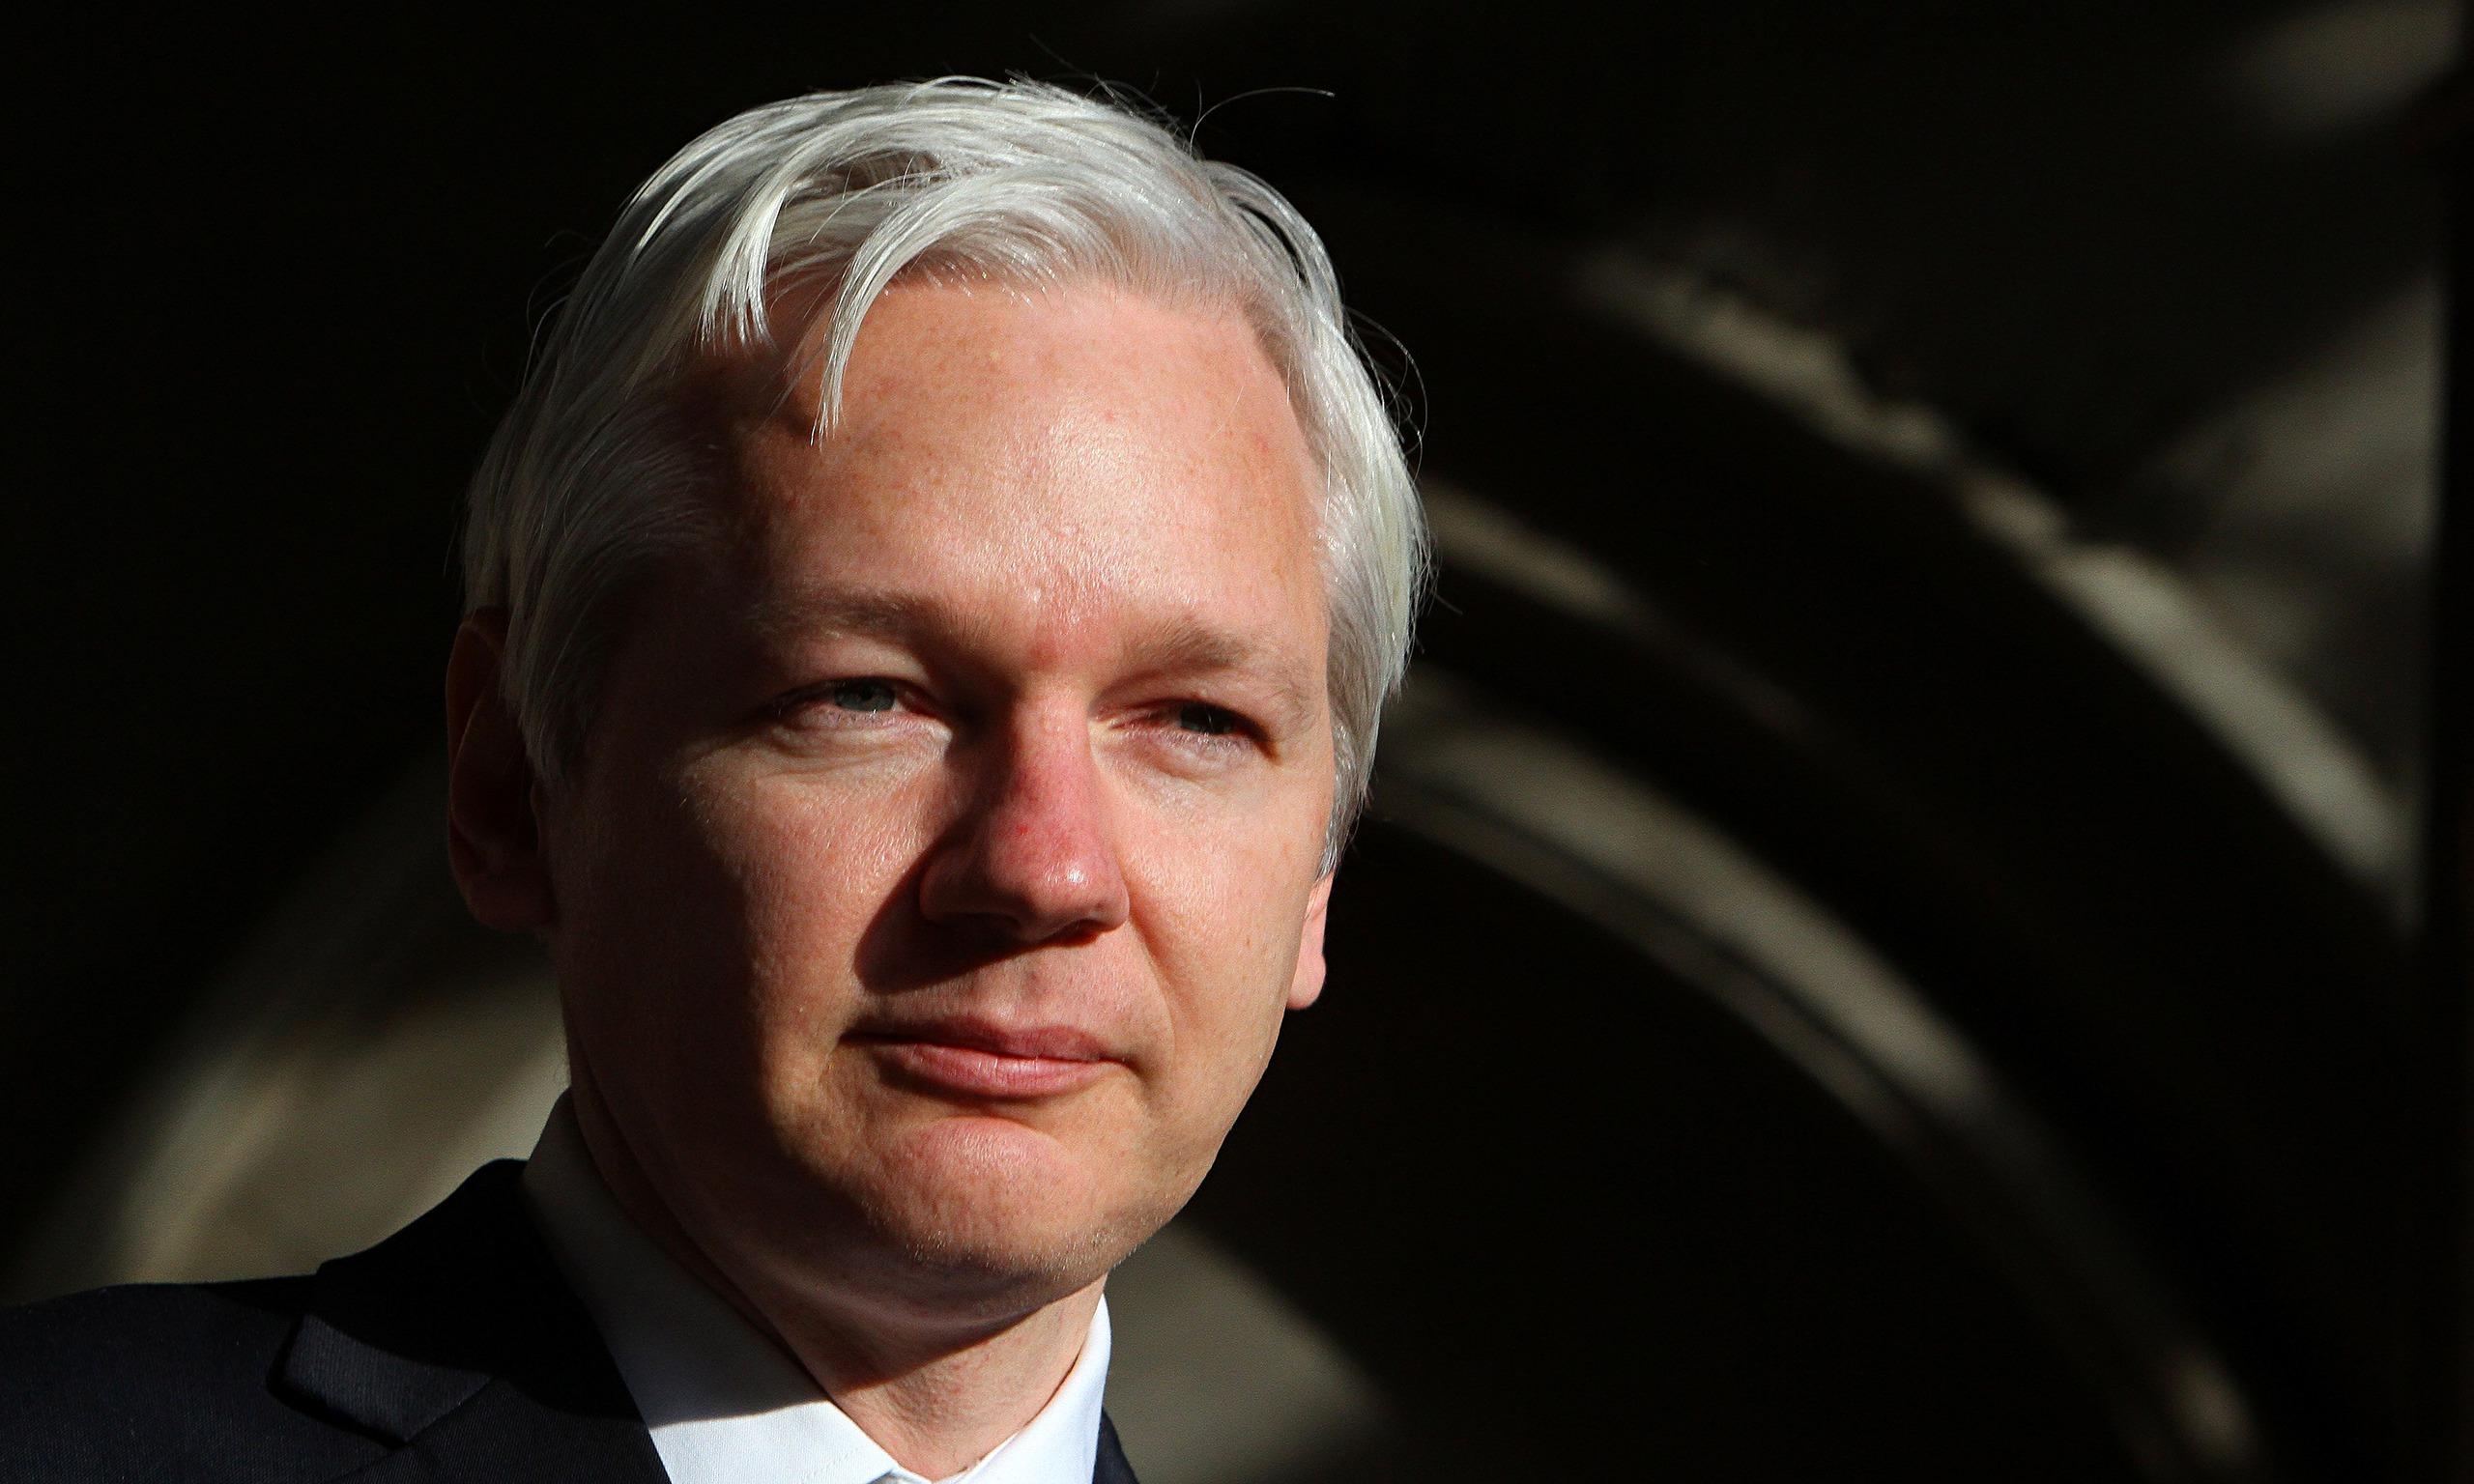 Julian assange autobiography